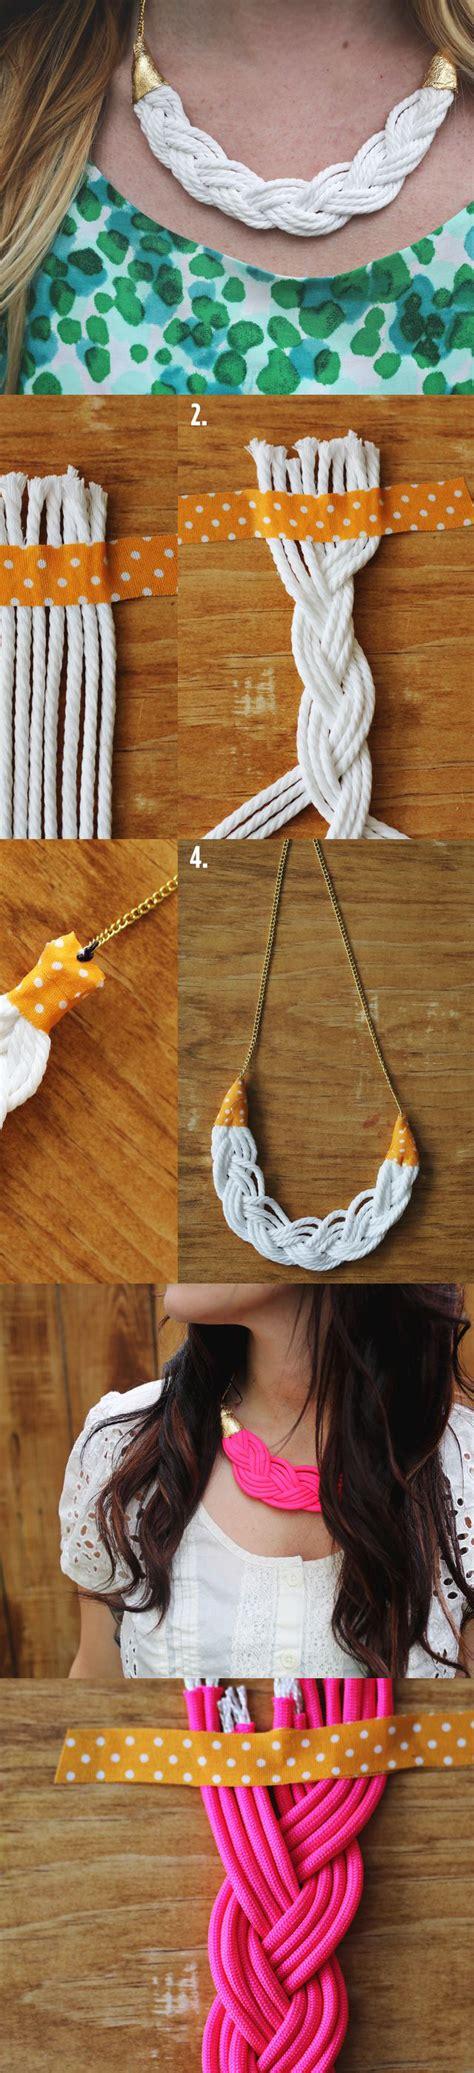 diy fashion amazingly easy to make diy fashion projects